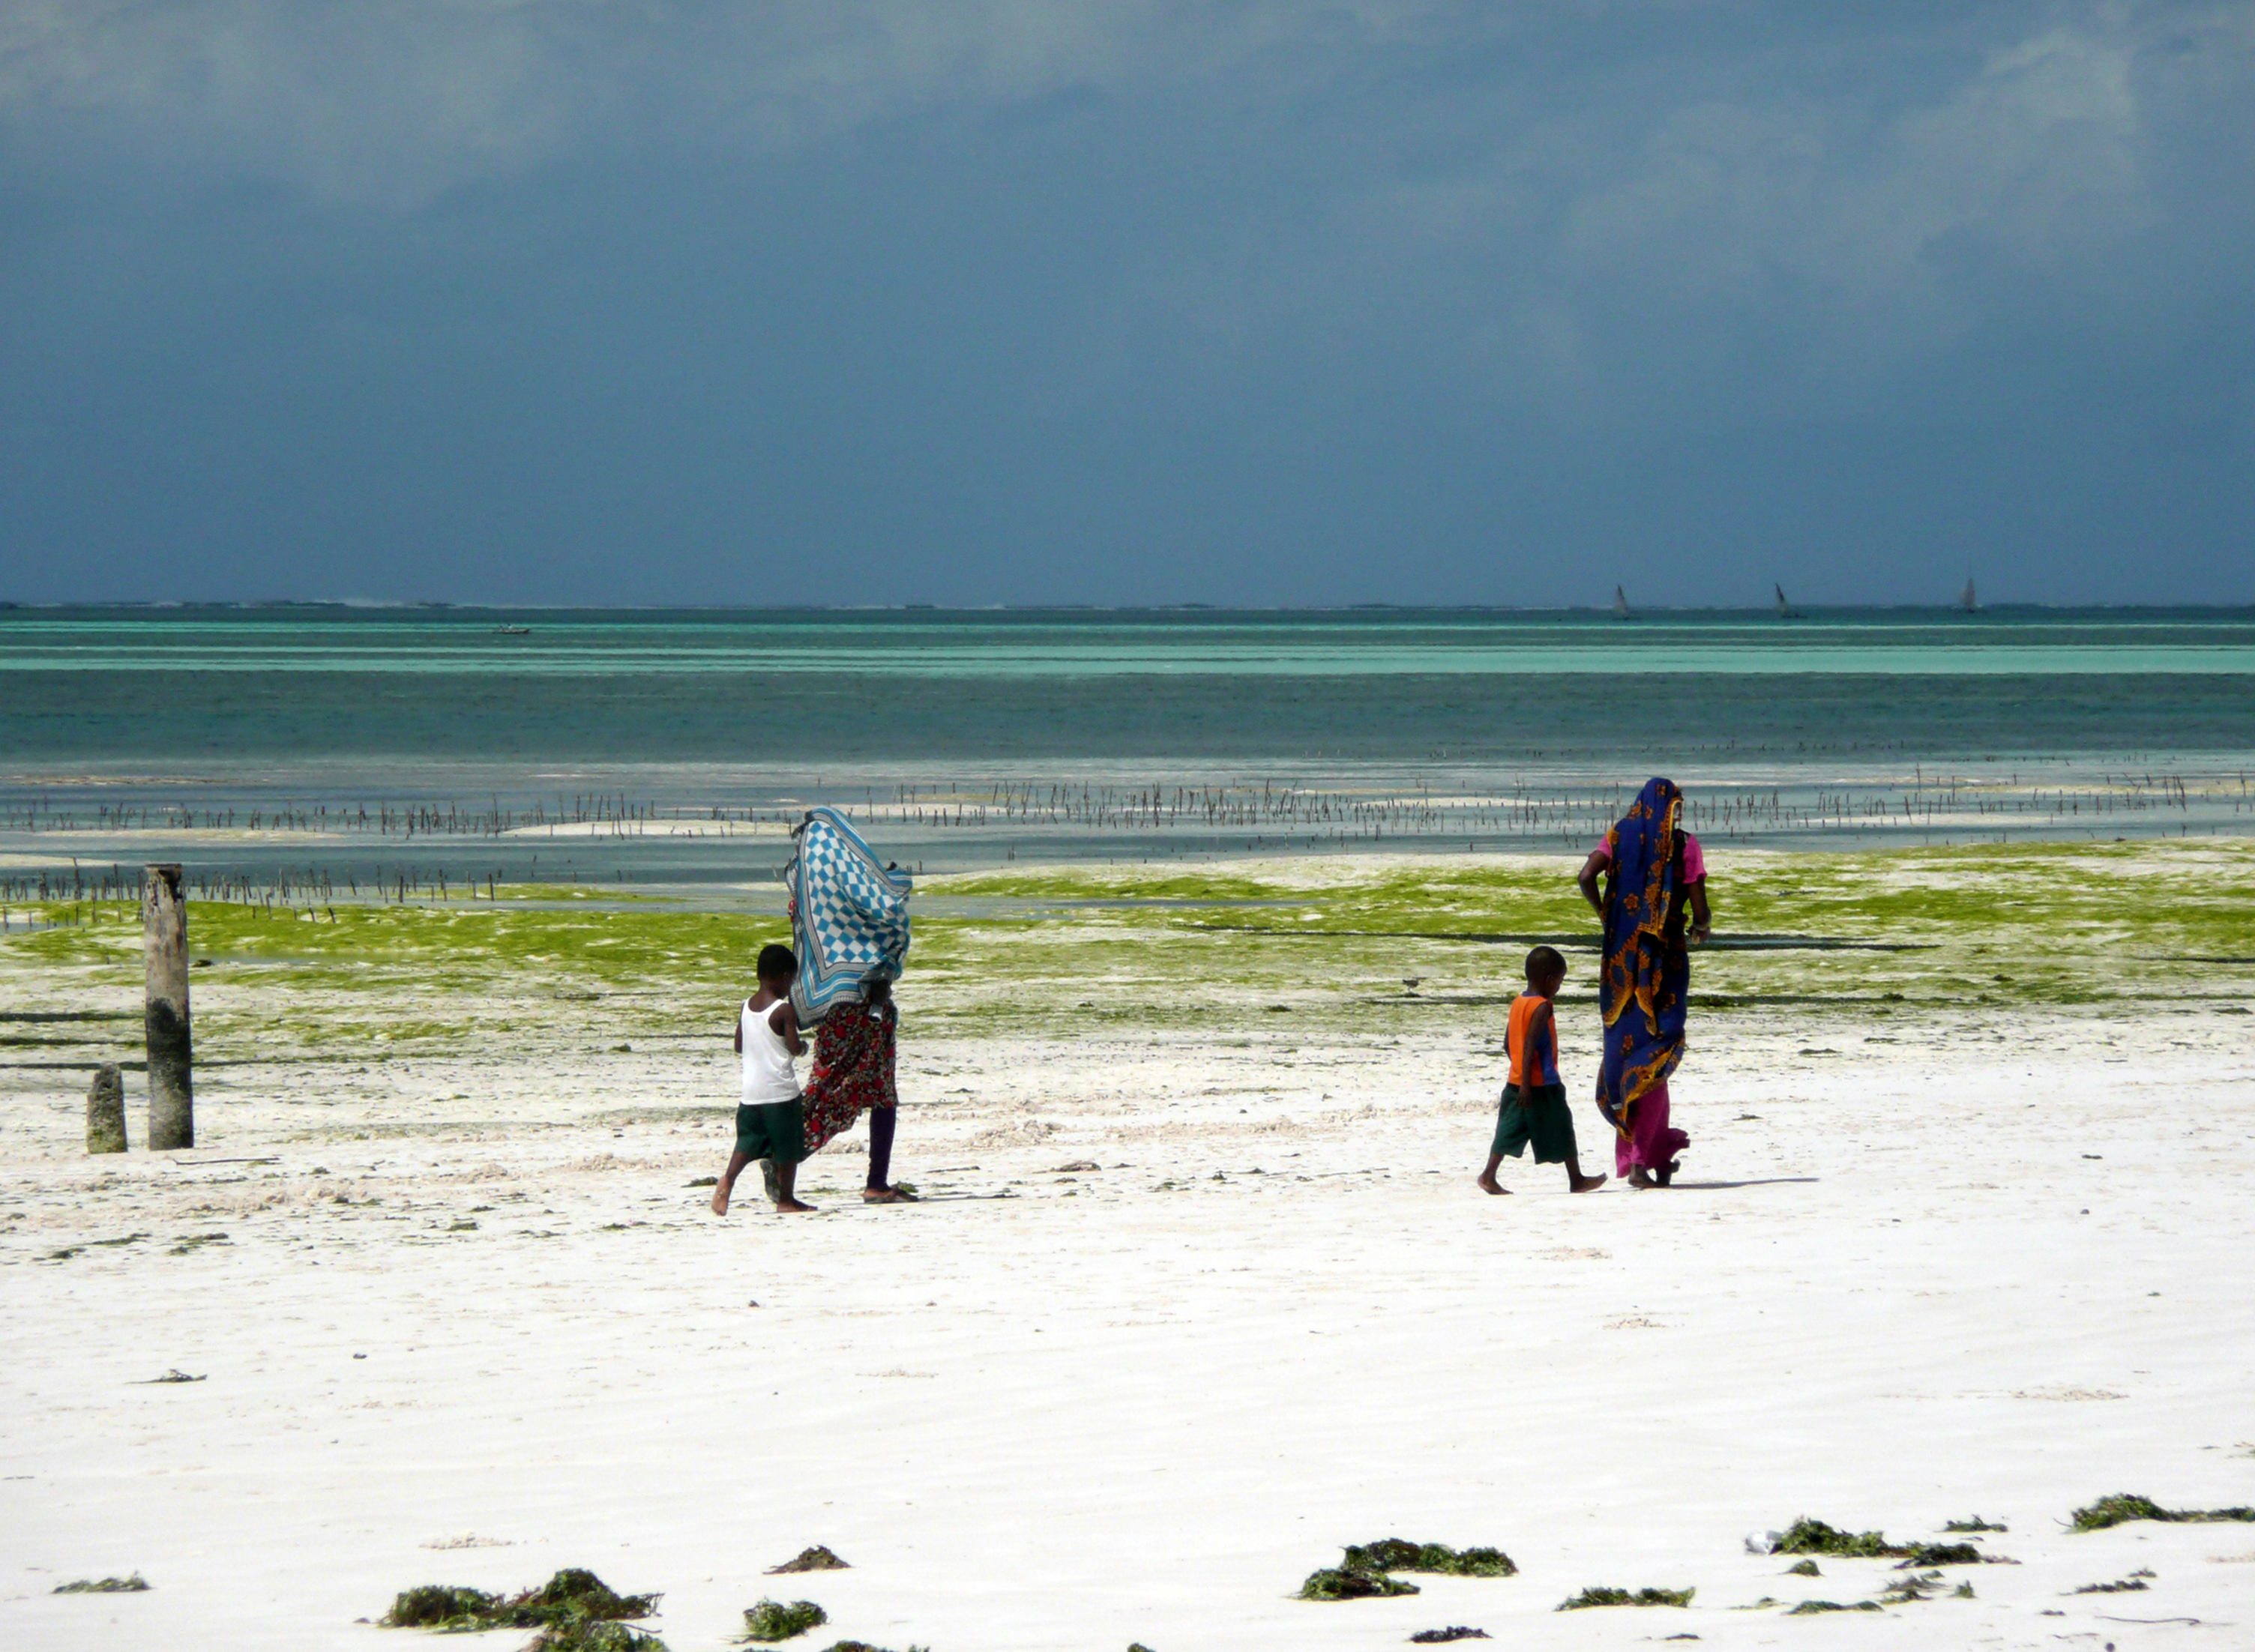 Ramasseuses d'algues, Kiwengwa, Zanzibar